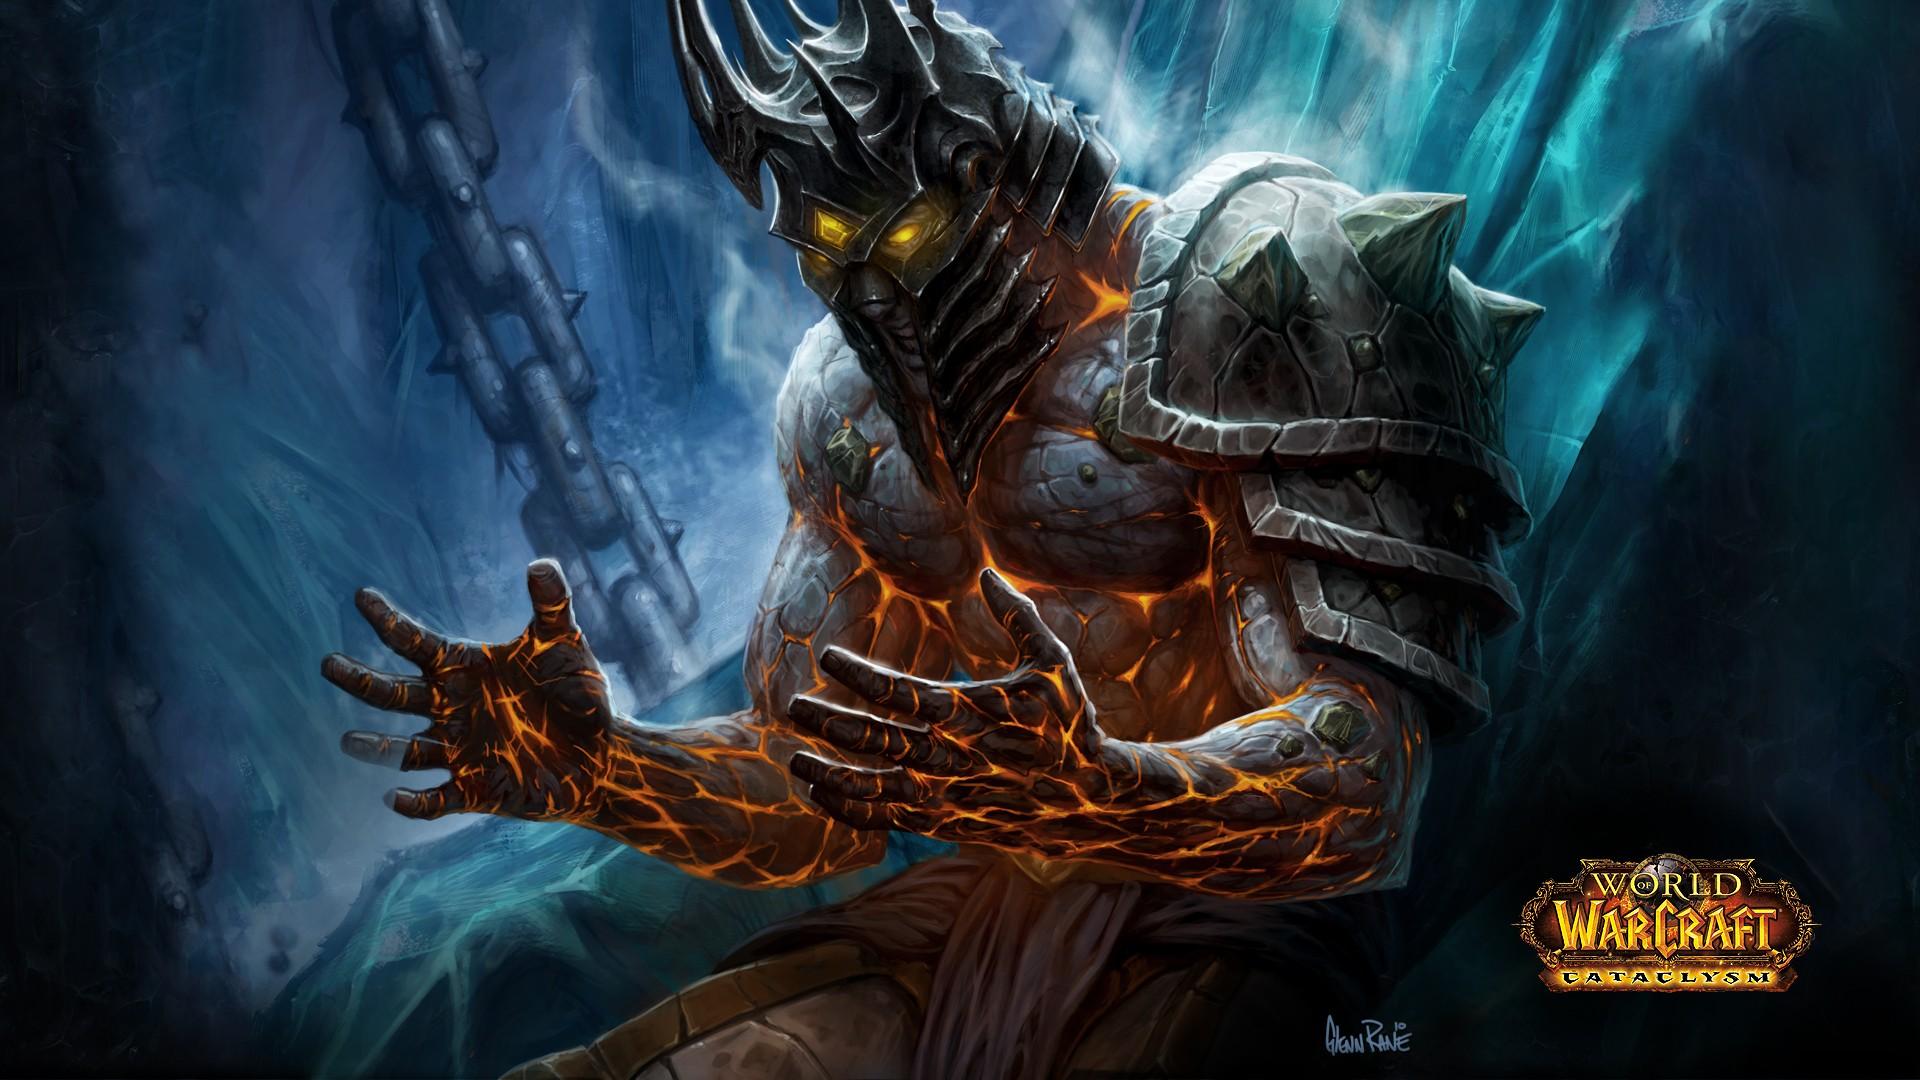 World Of Warcraft Backgrounds 1920x1080: World Of Warcraft Wallpaper